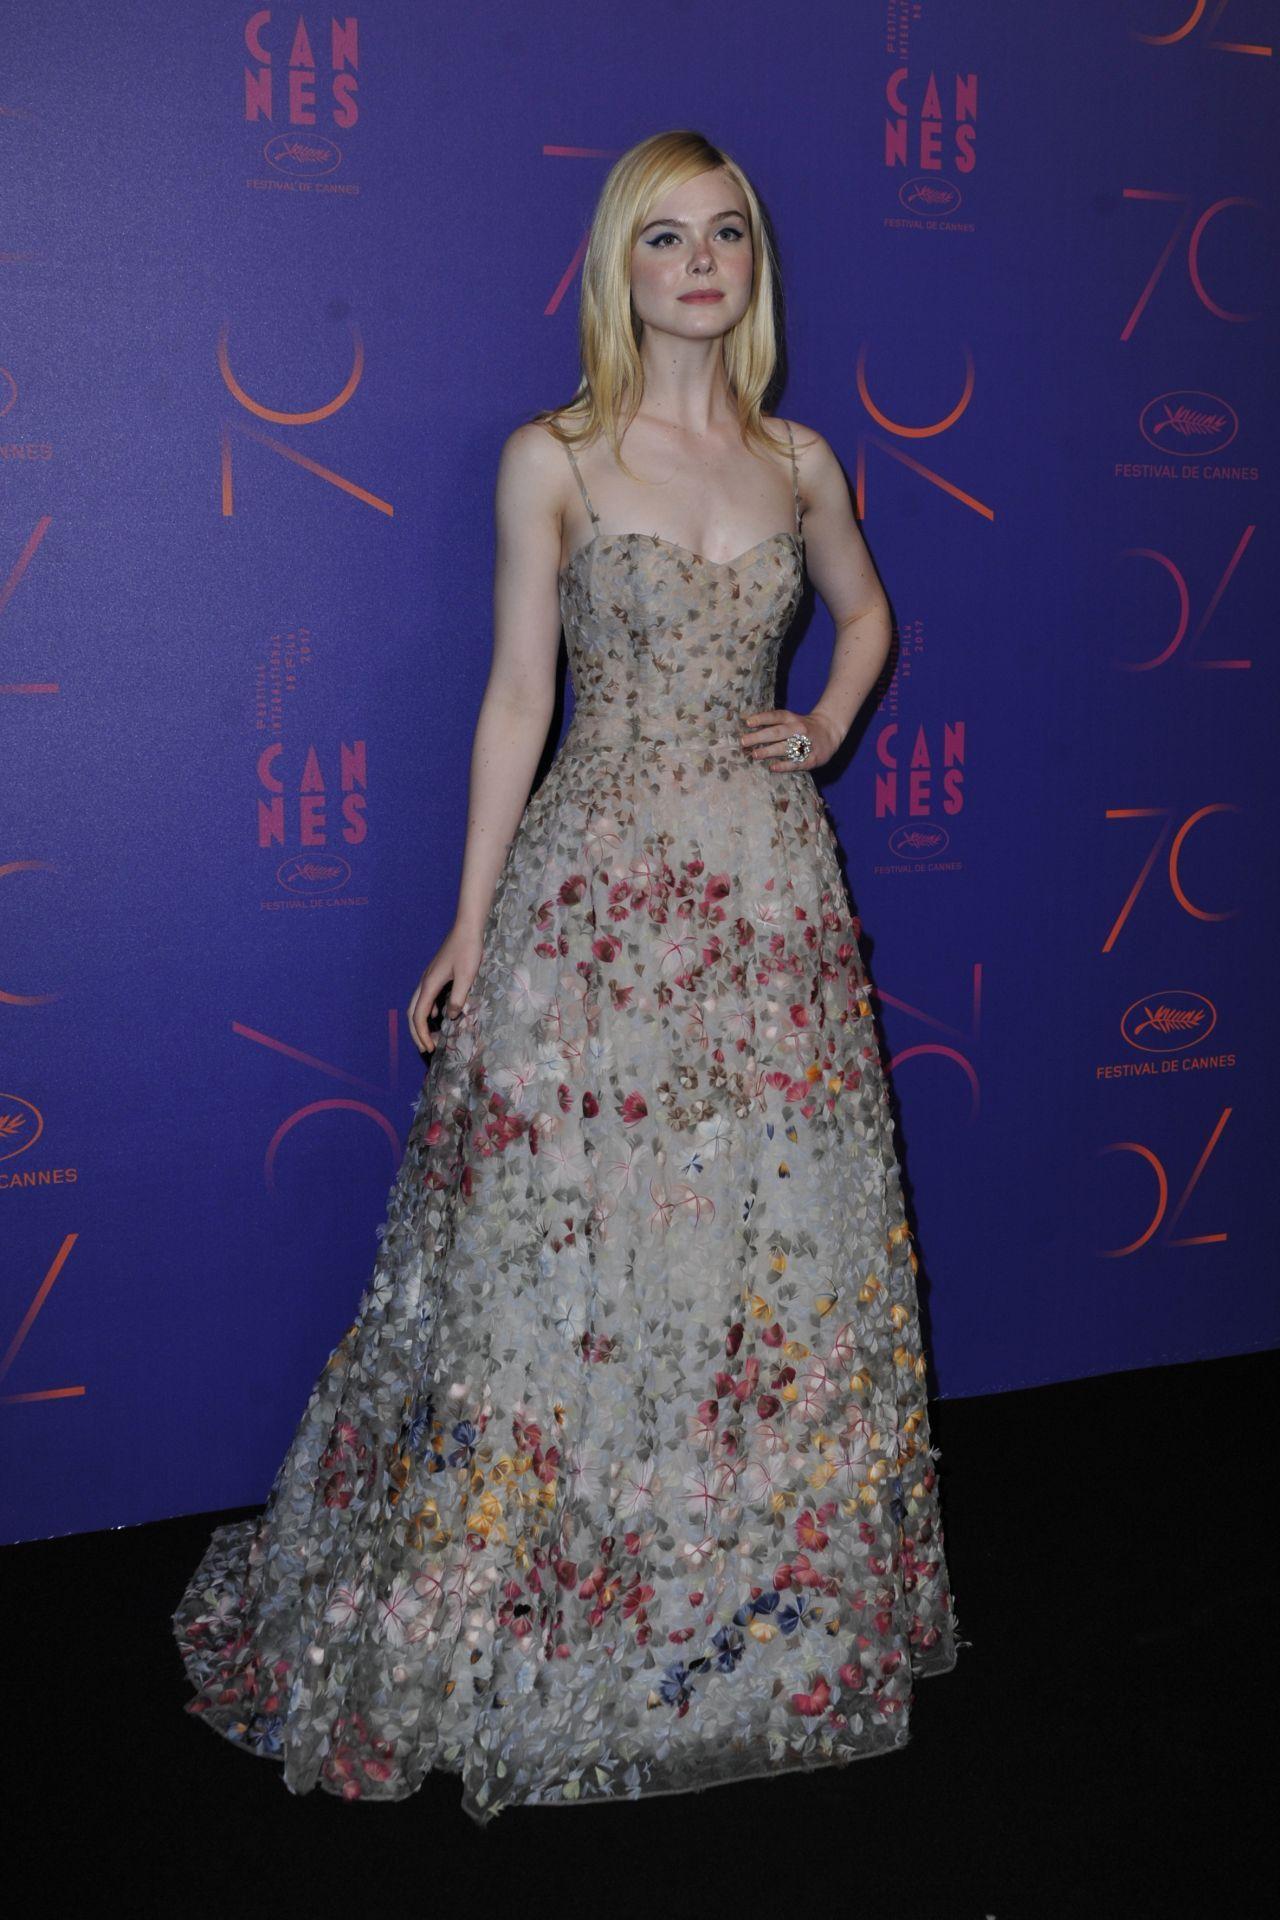 #Cannes, #CannesFilmFestival, #Elle, #ElleFanning, #Movie Elle Fanning at 70th Anniversary Dinner – Cannes Film Festival 05/23/2017 | Celebrity Uncensored! Read more: http://celxxx.com/2017/05/elle-fanning-at-70th-anniversary-dinner-cannes-film-festival-05232017/